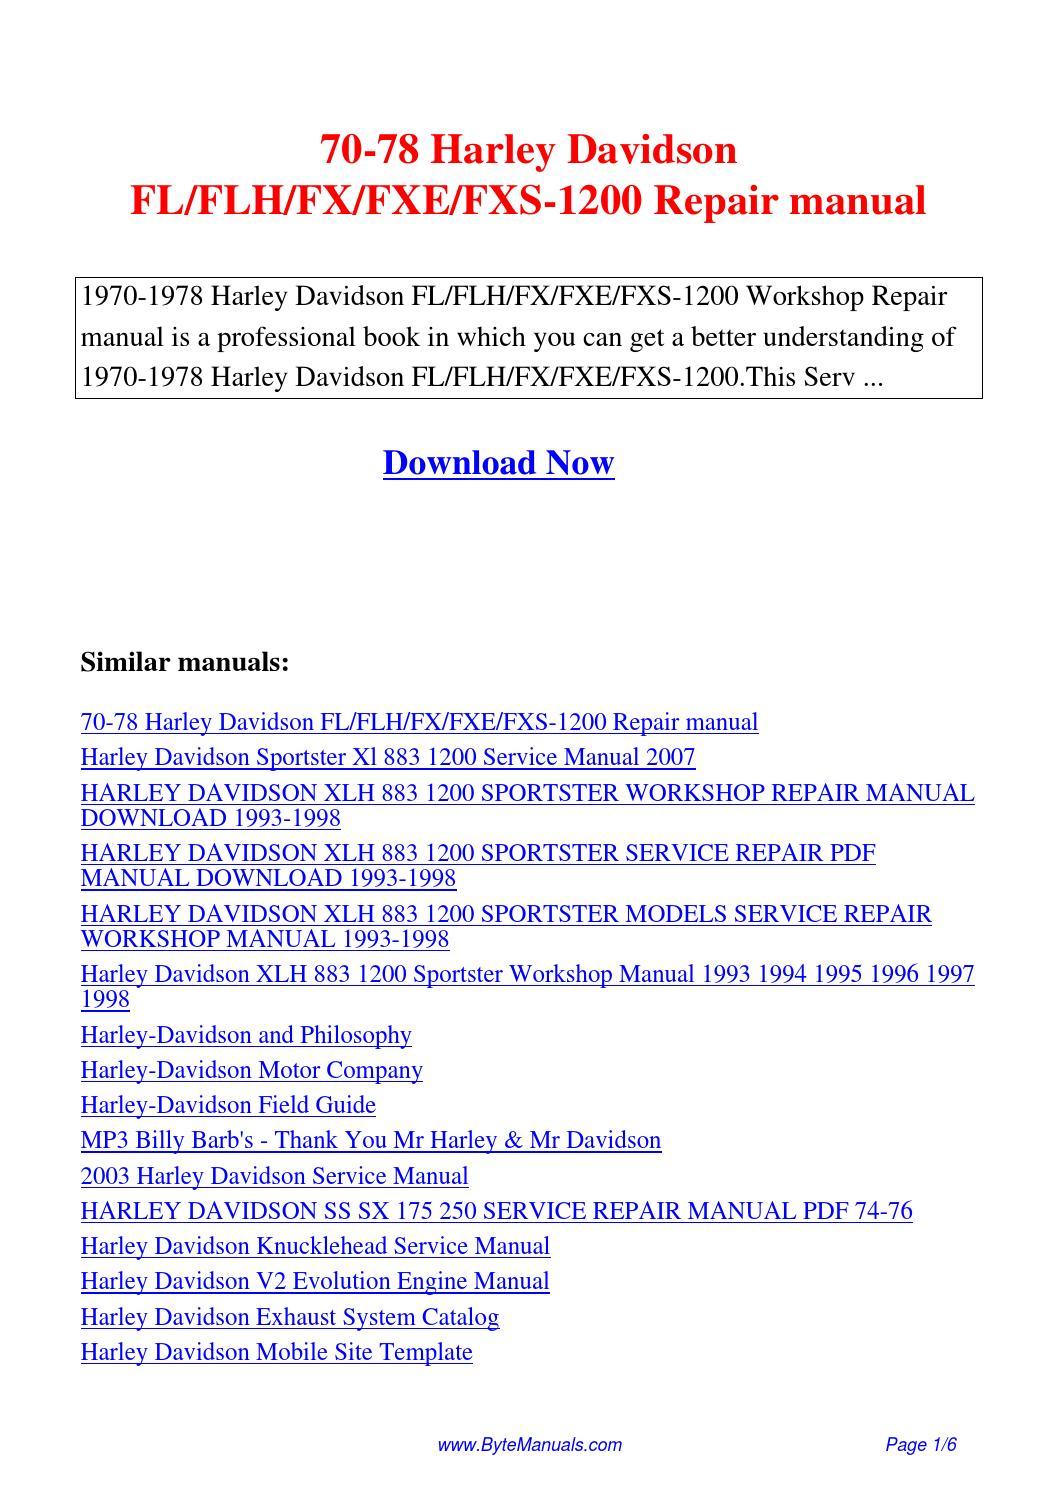 70-78 harley davidson fl flh fx fxe fxs-1200 repair manual.pdf by